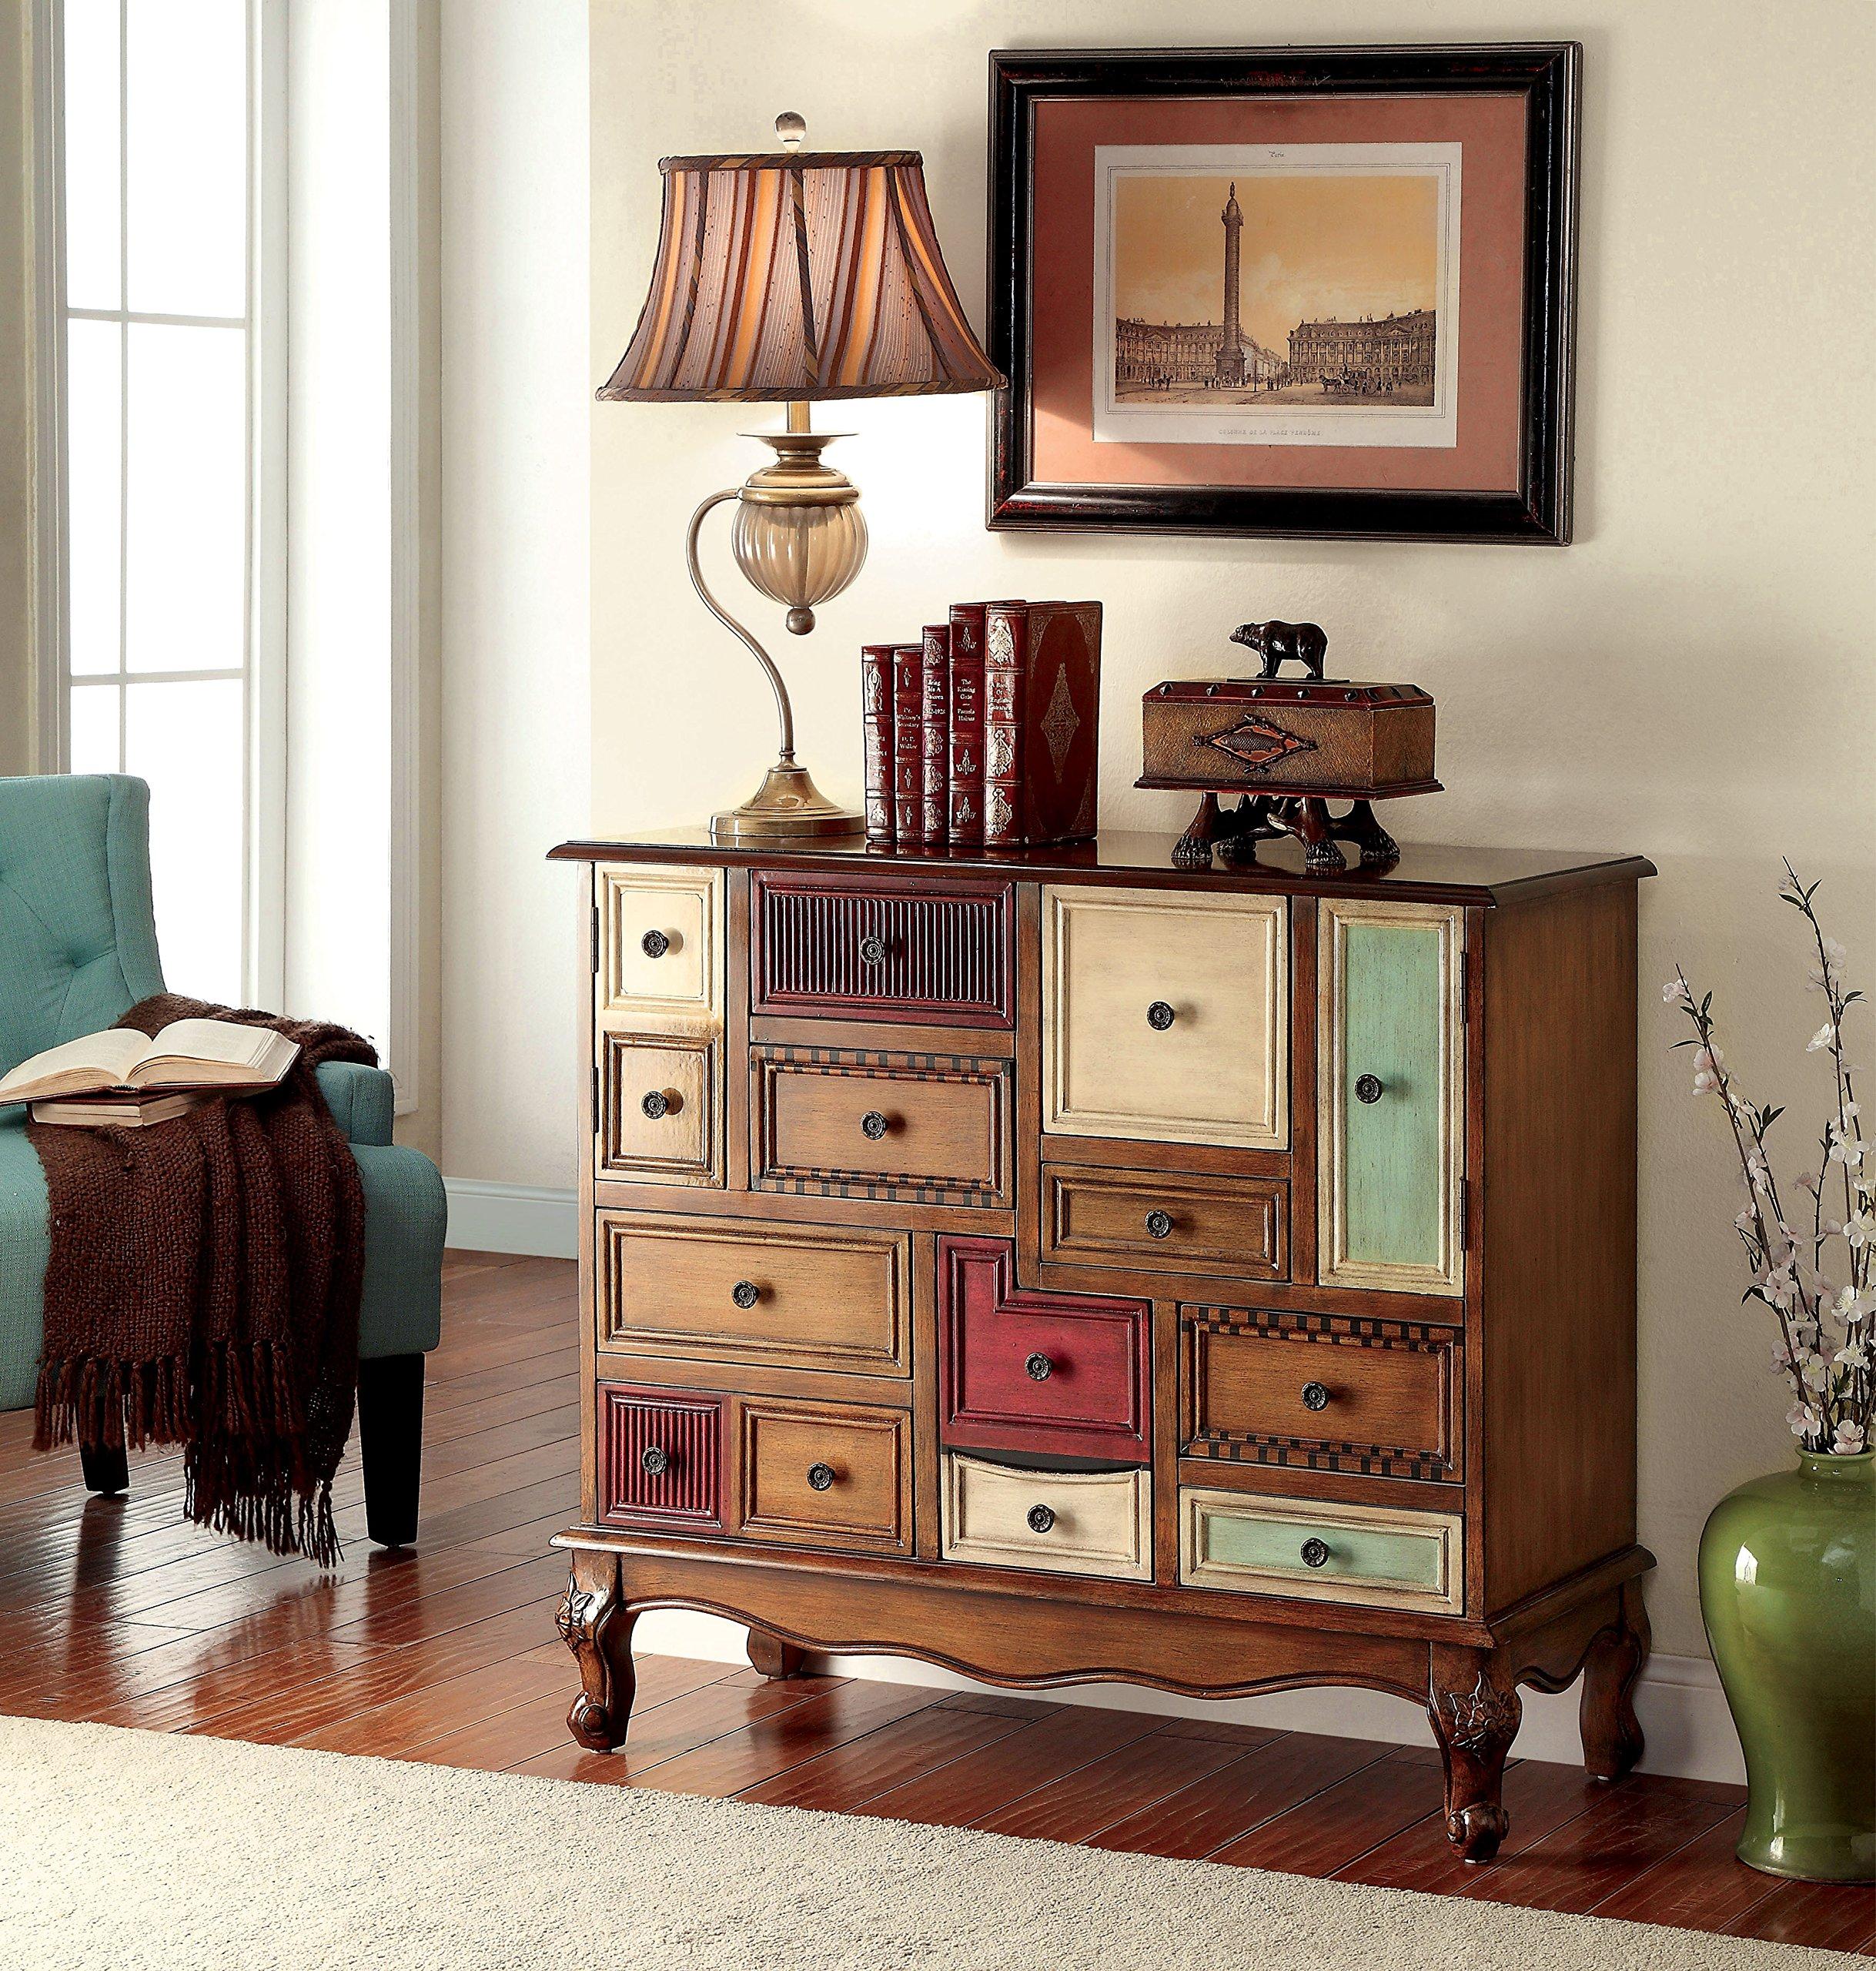 Furniture Of America Zeppo Vintage Style Storage Chest